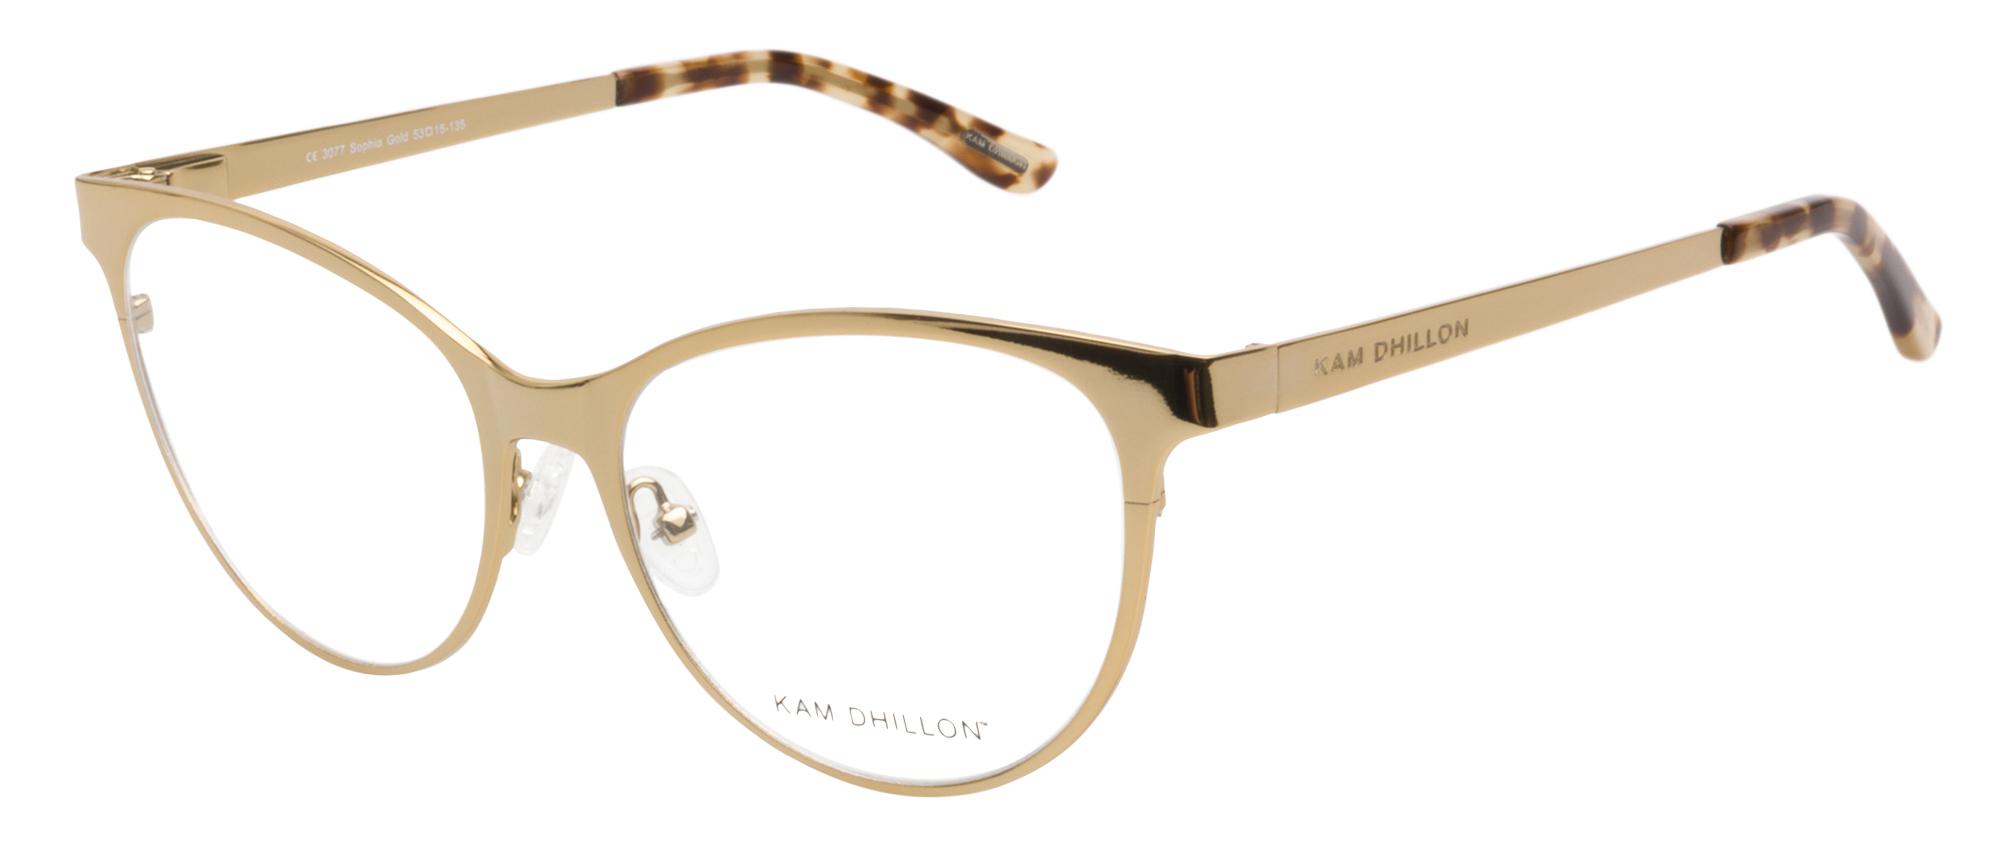 Eyewear Trends 2015